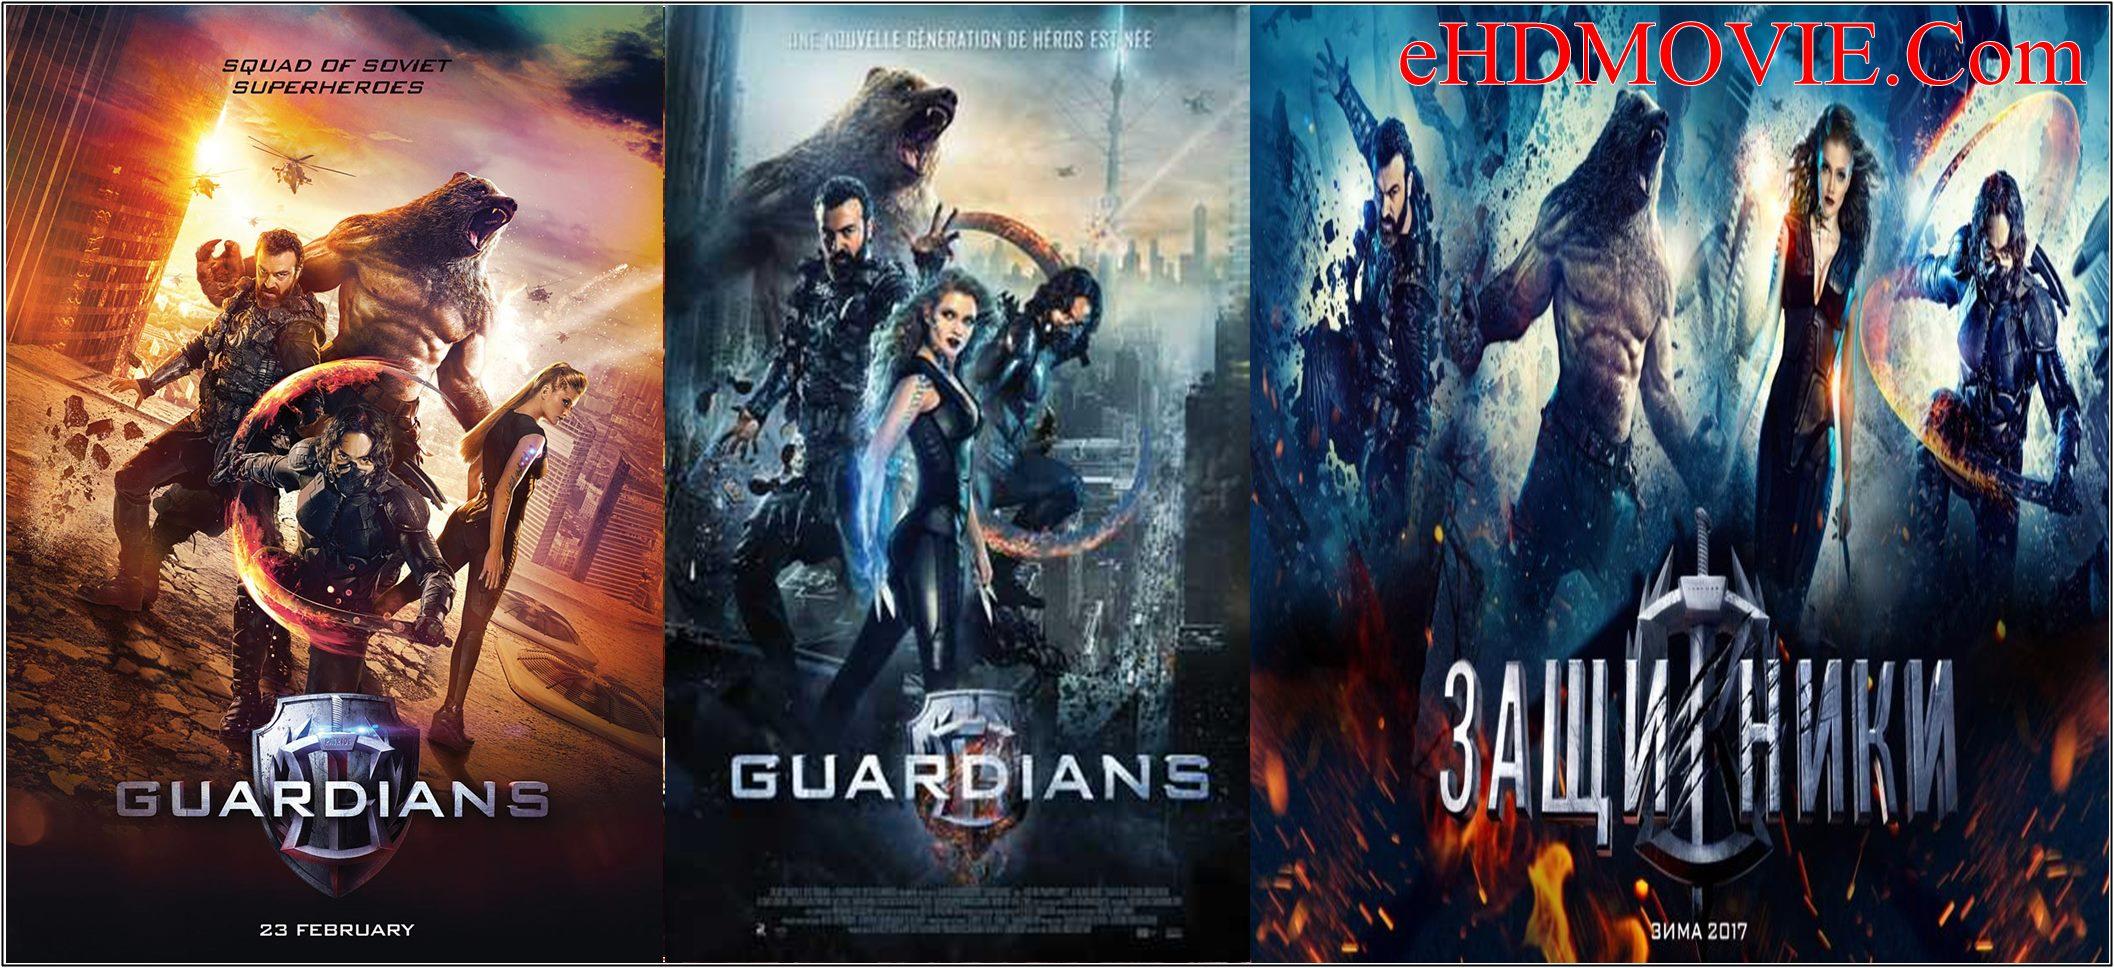 The Guardians 2017 Full Movie Dual Audio [Hindi – English] 720p – 480p ORG BRRip 400MB – 1GB ESubs Free Download